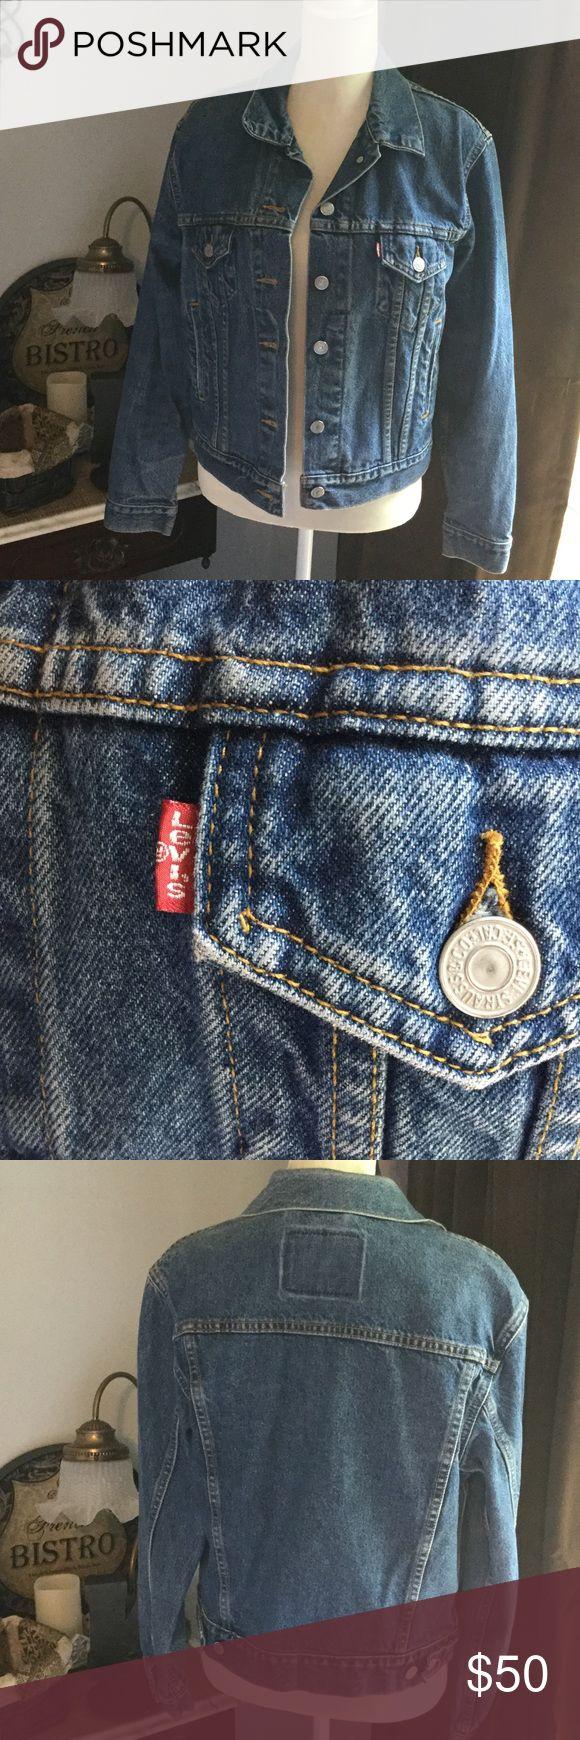 Vintage Levi's Jean Jacket Nice Levi's Jean Jacket. Vintage but Like New. Size Medium. Price Firm. Levi's Jackets & Coats Jean Jackets